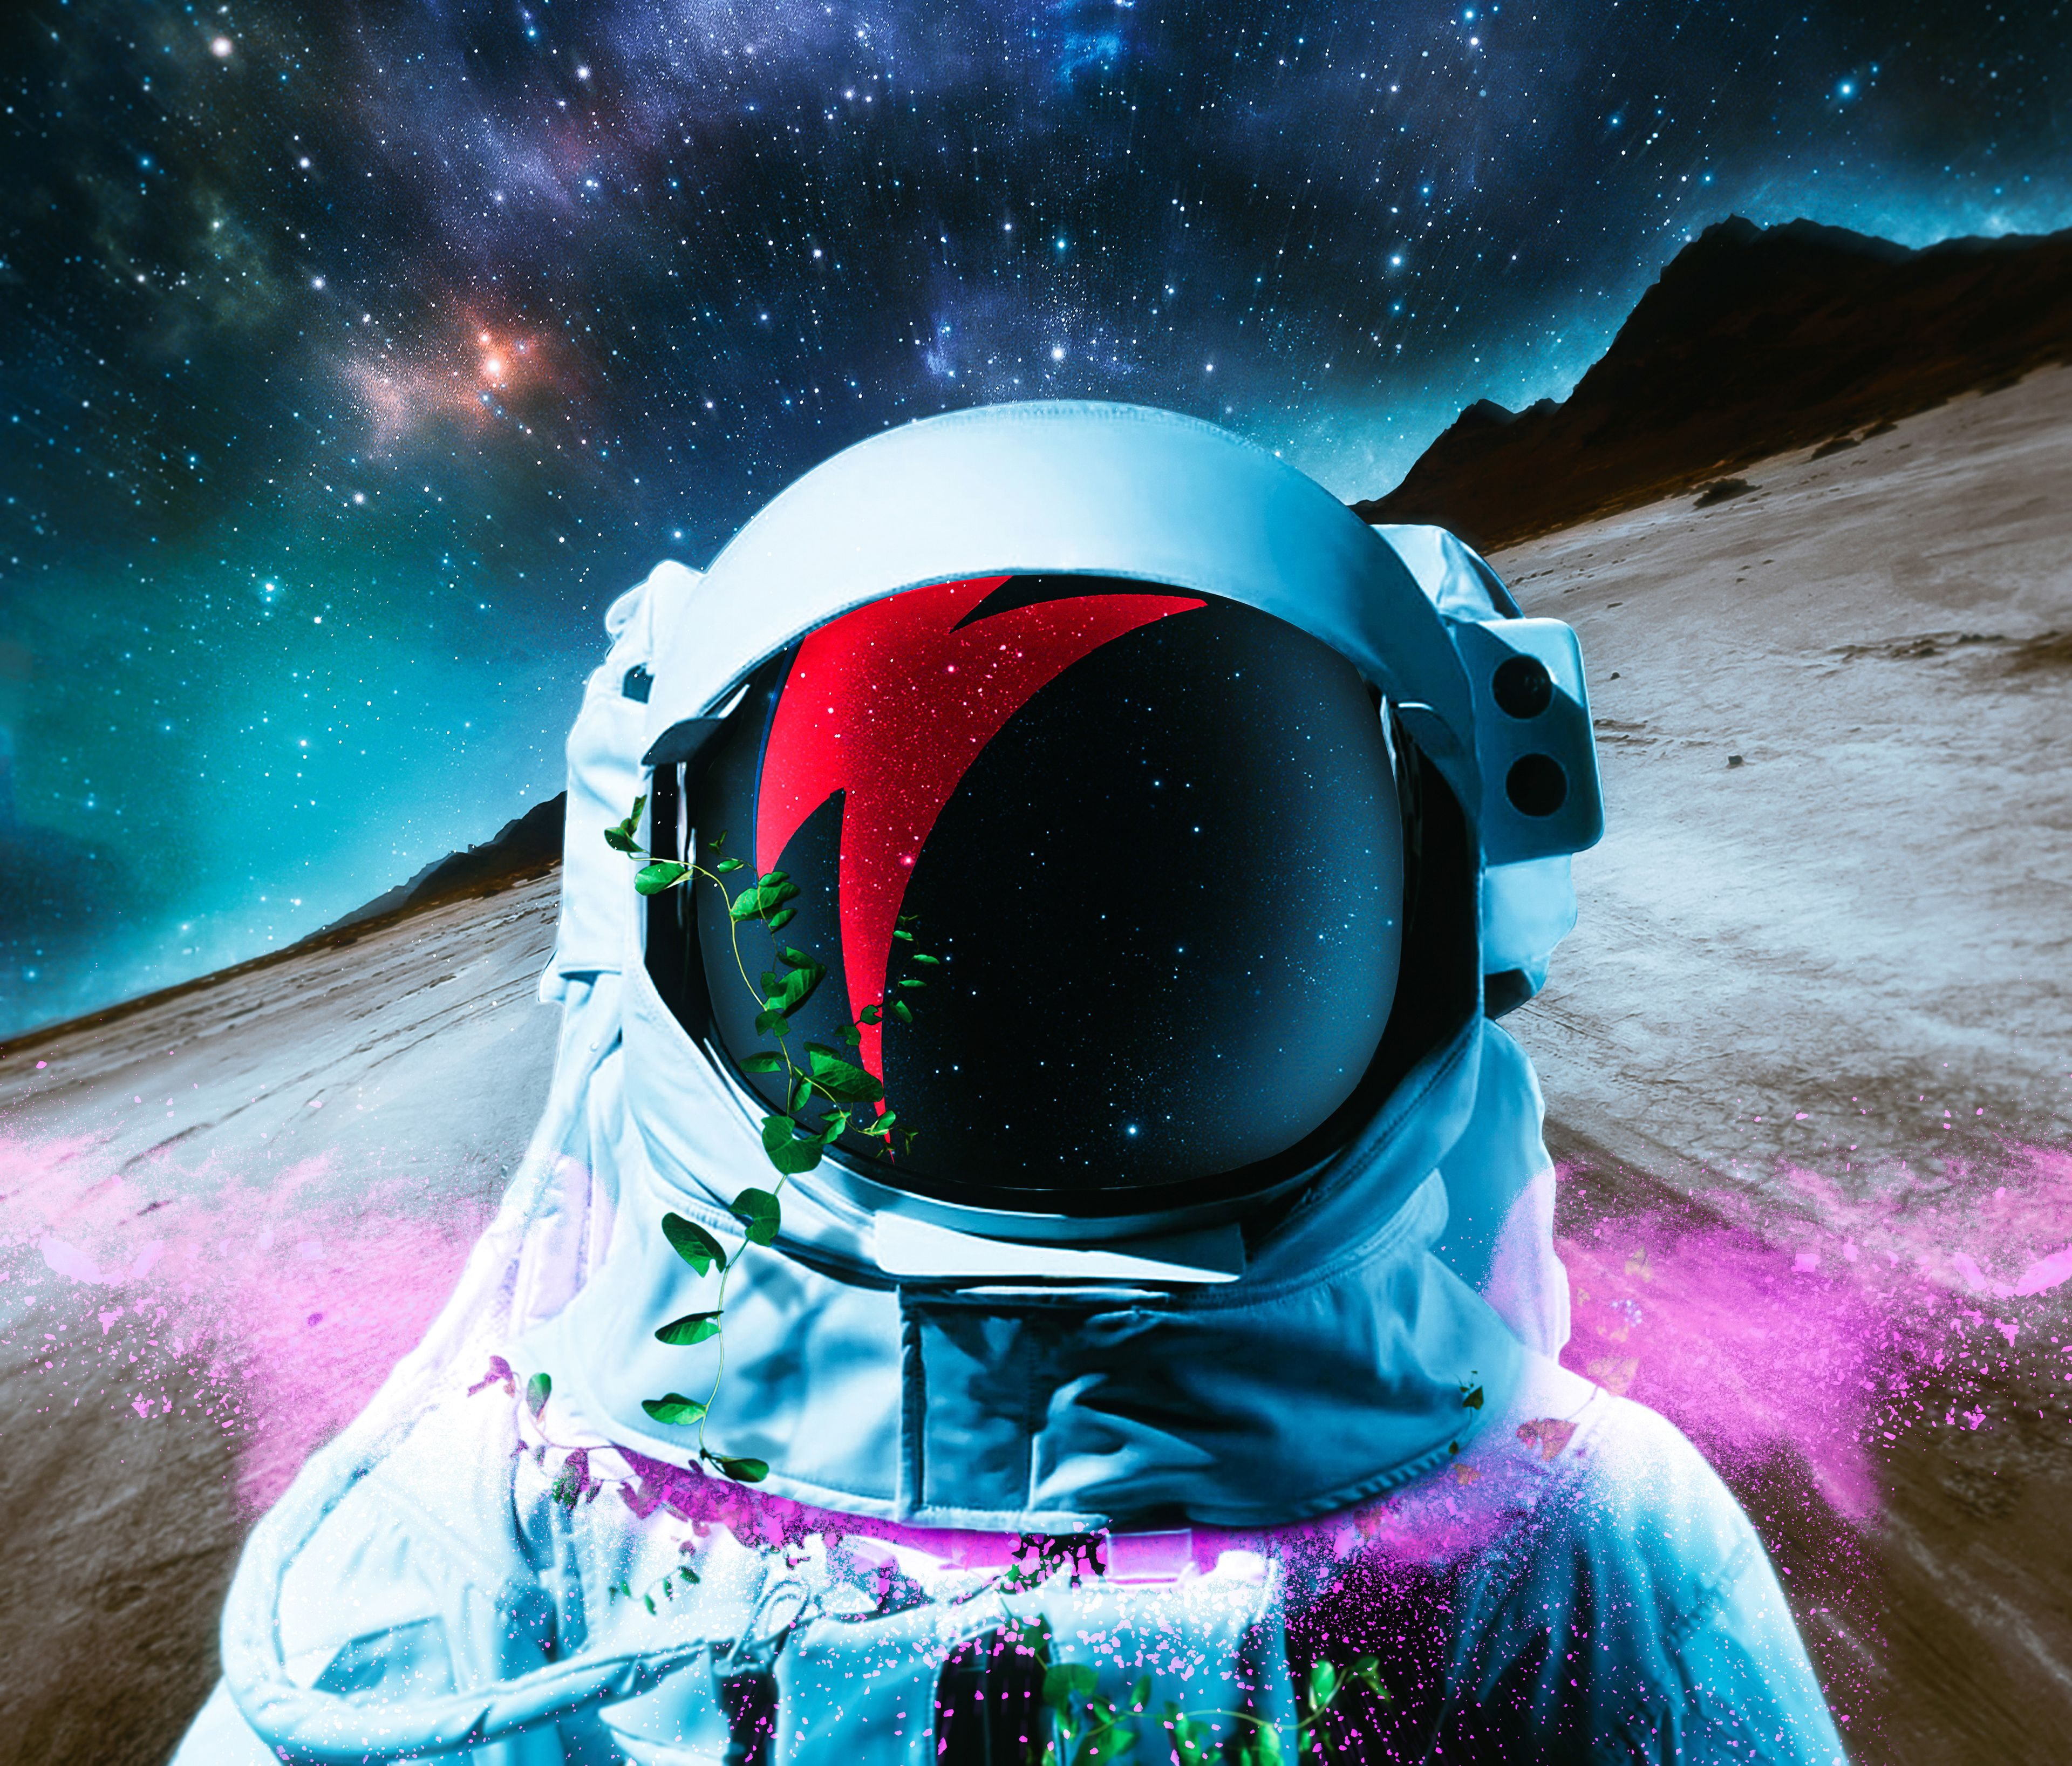 4k Astronaut Wallpapers Top Free 4k Astronaut Backgrounds Wallpaperaccess